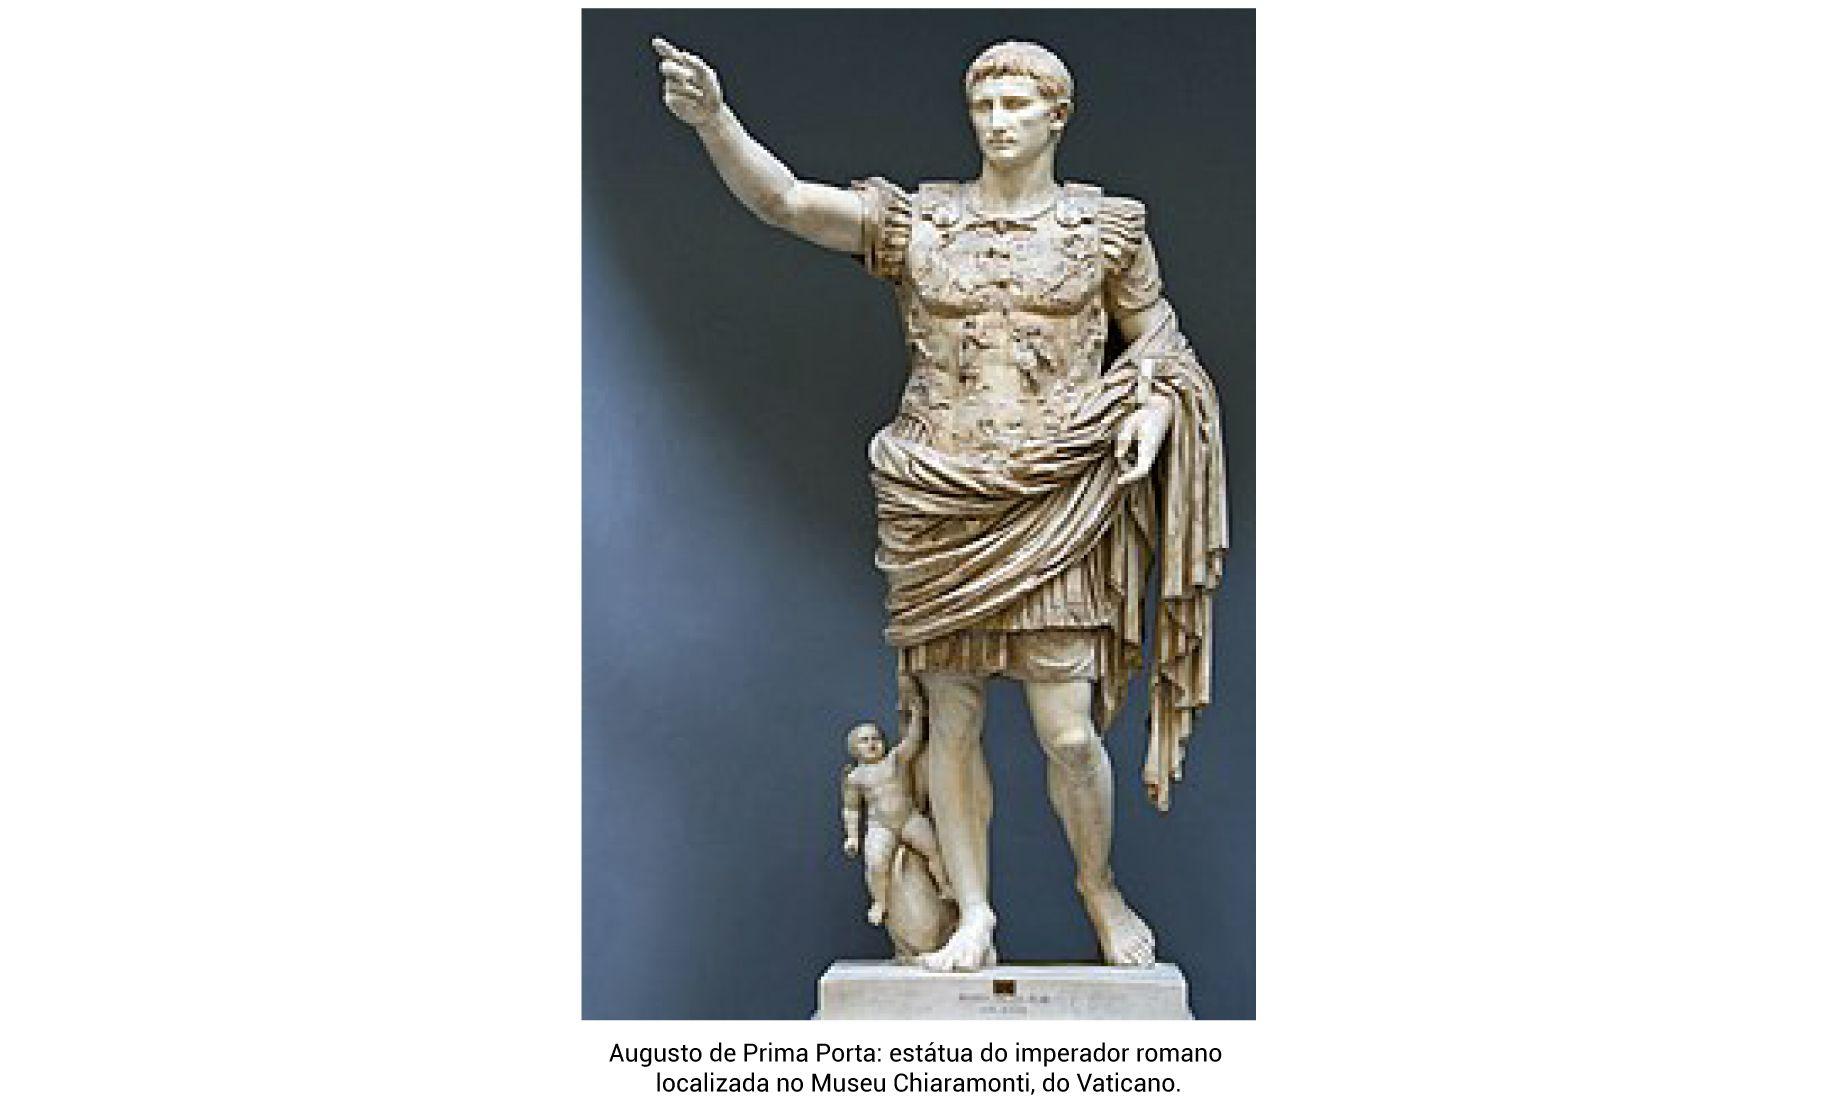 Augusto de Prima Porta estátua do imperador romano localizada no Museu Chiaramonti, do Vaticano.